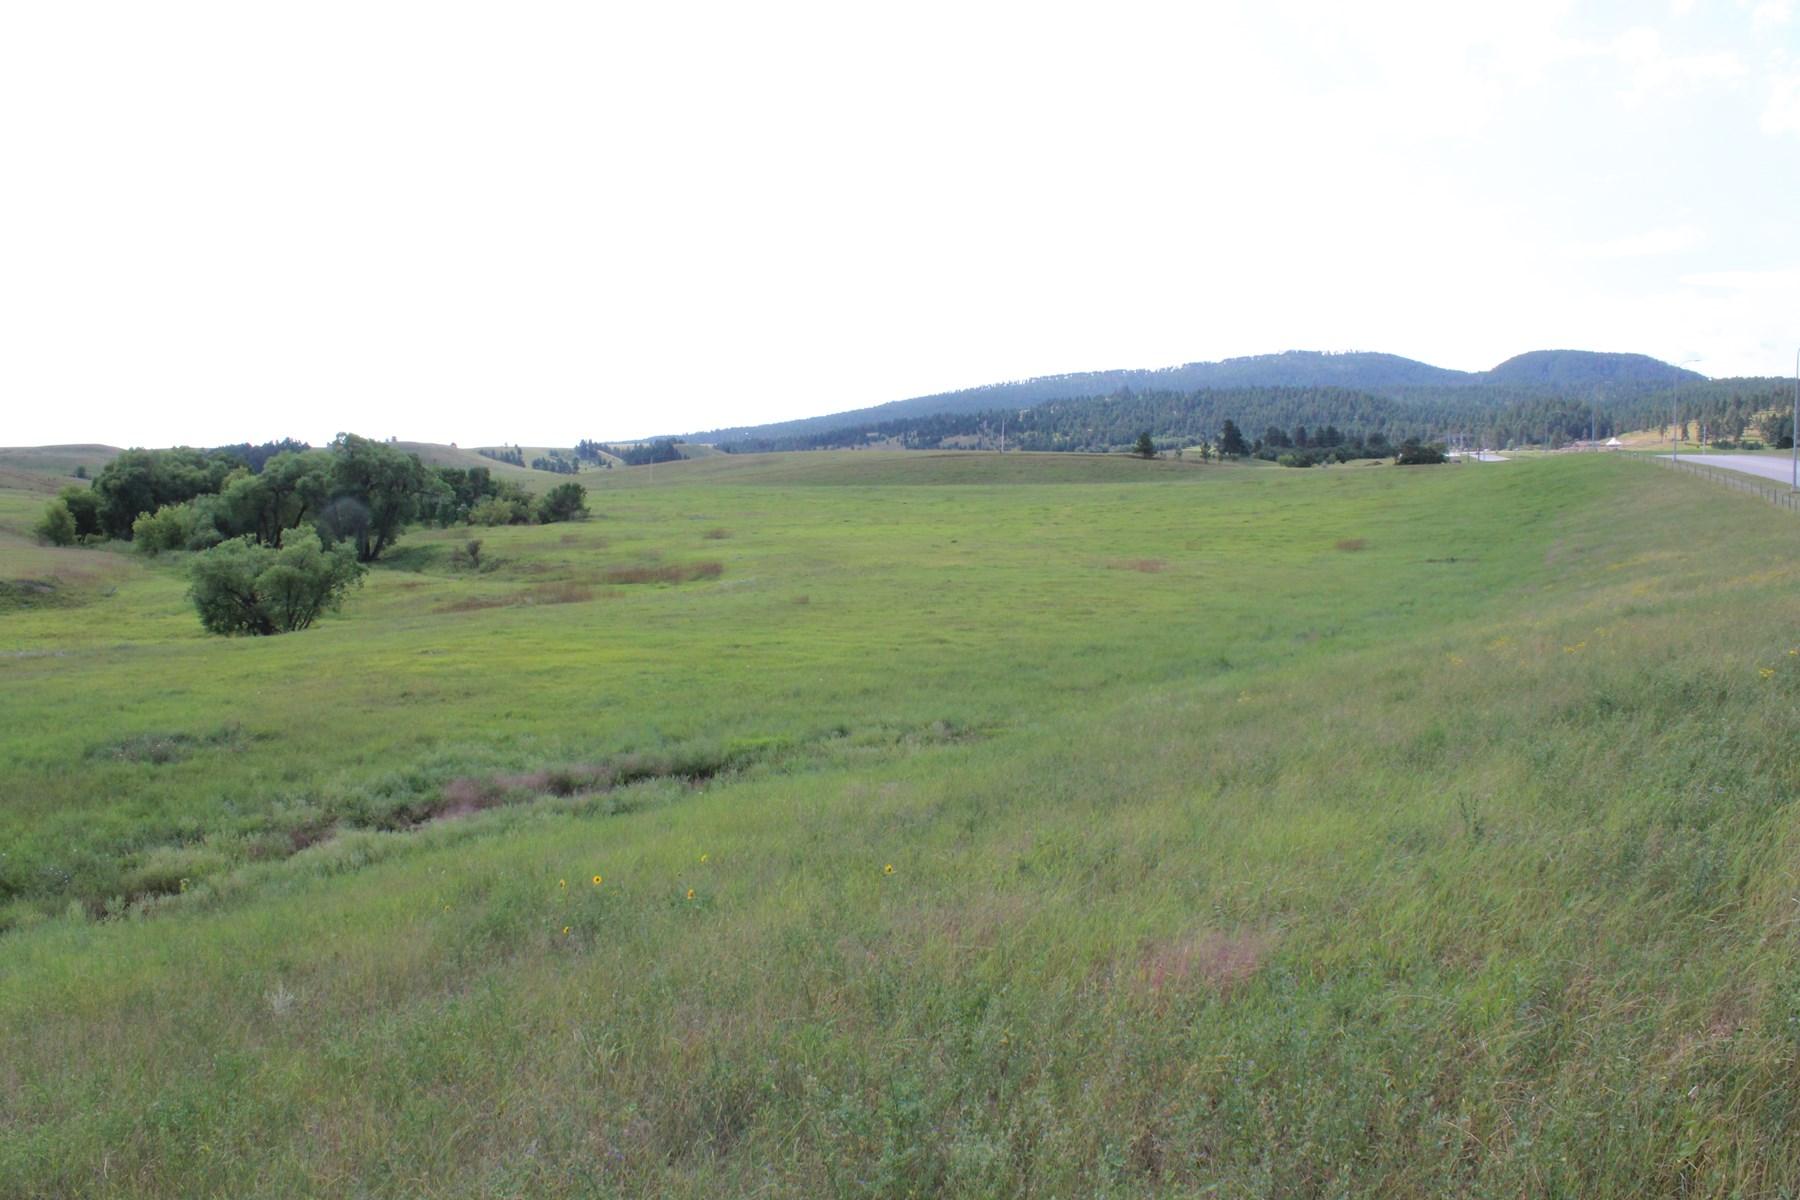 STURGIS SD COMMERCIAL / DEVELOPMENT LAND FOR SALE